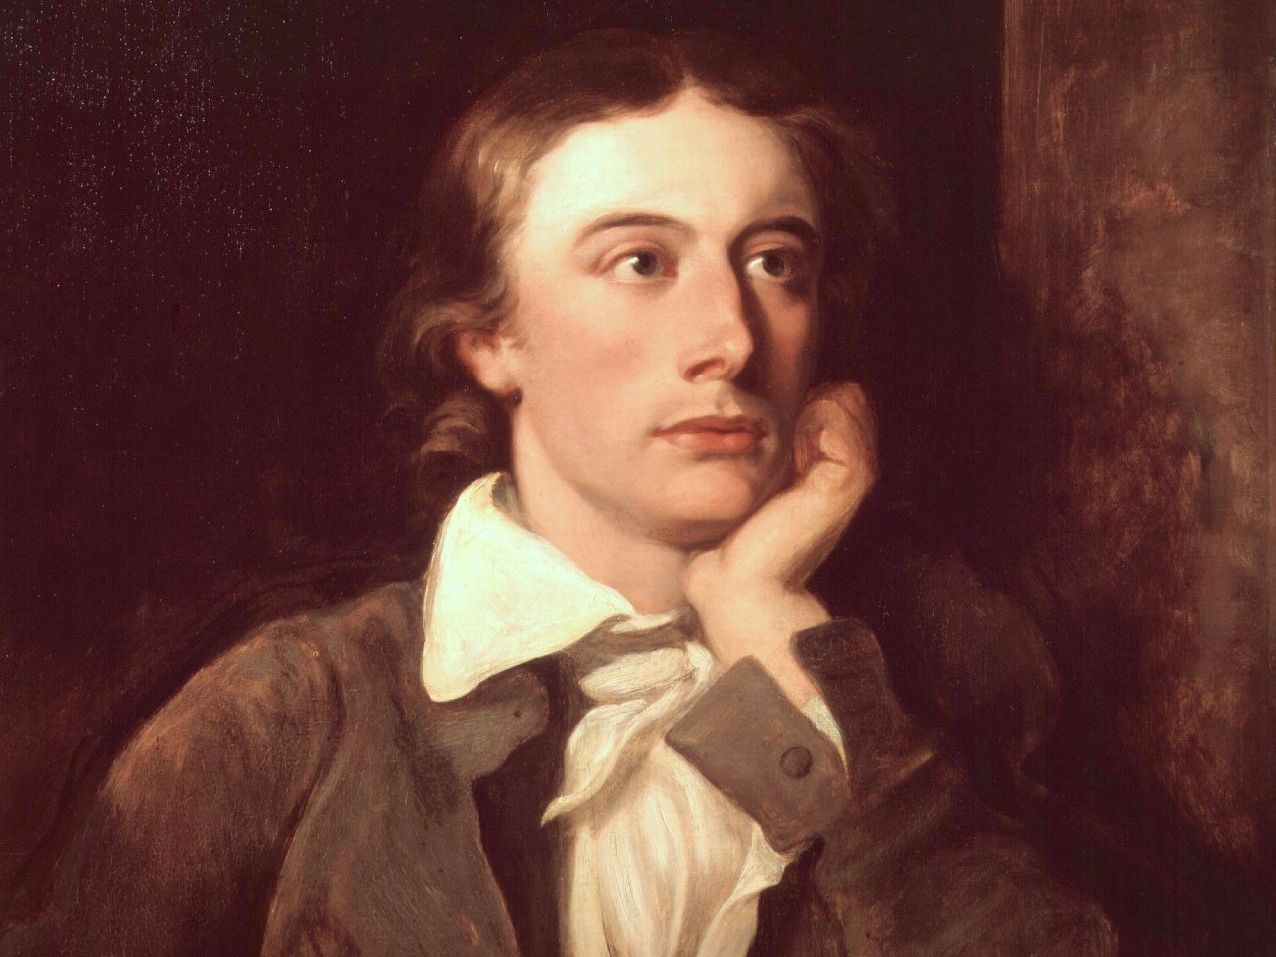 Edexcel Literature: John Keats (part I)